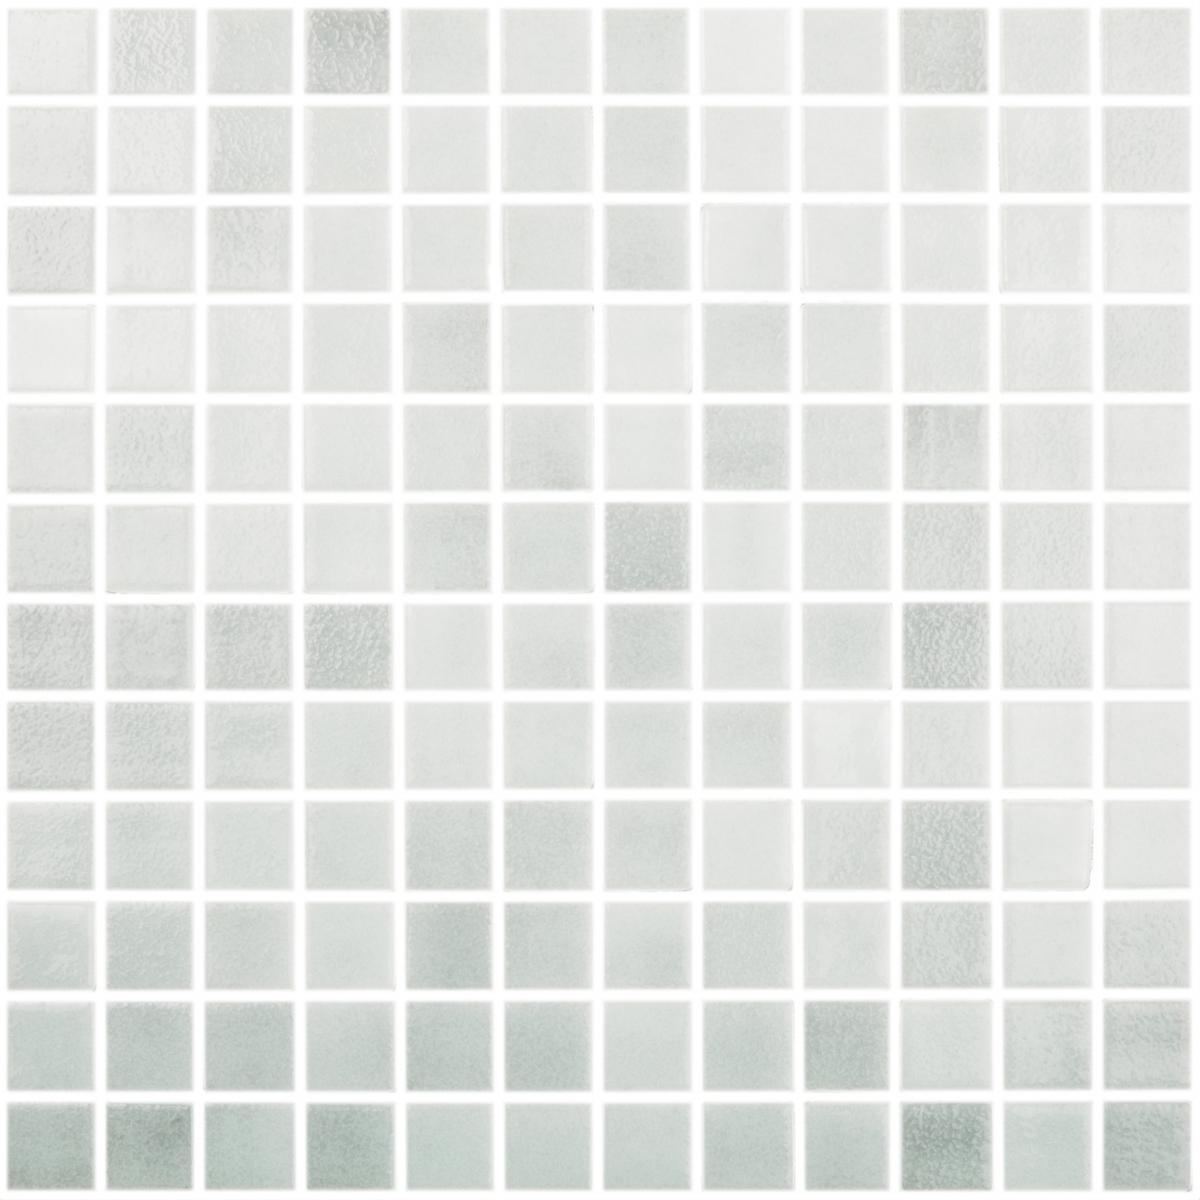 Gresite gris claro niebla (m2)